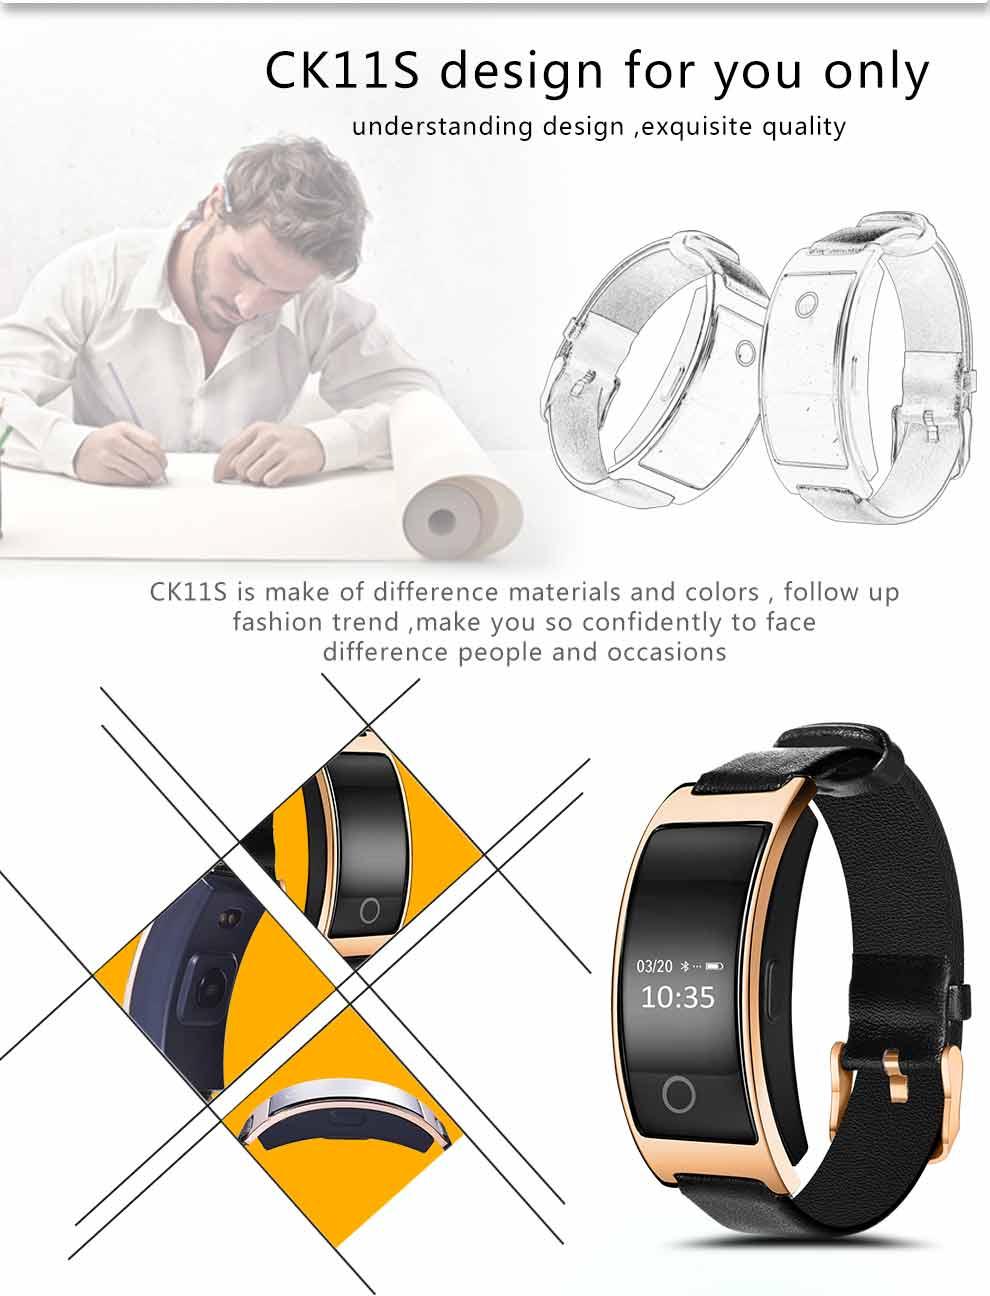 CK11S Smart Band Blood Pressure Heart Rate Monitor Wrist Watch CK11S Smart Band Blood Pressure Heart Rate Monitor Wrist Watch HTB1 P3VQFXXXXc XpXXq6xXFXXXU